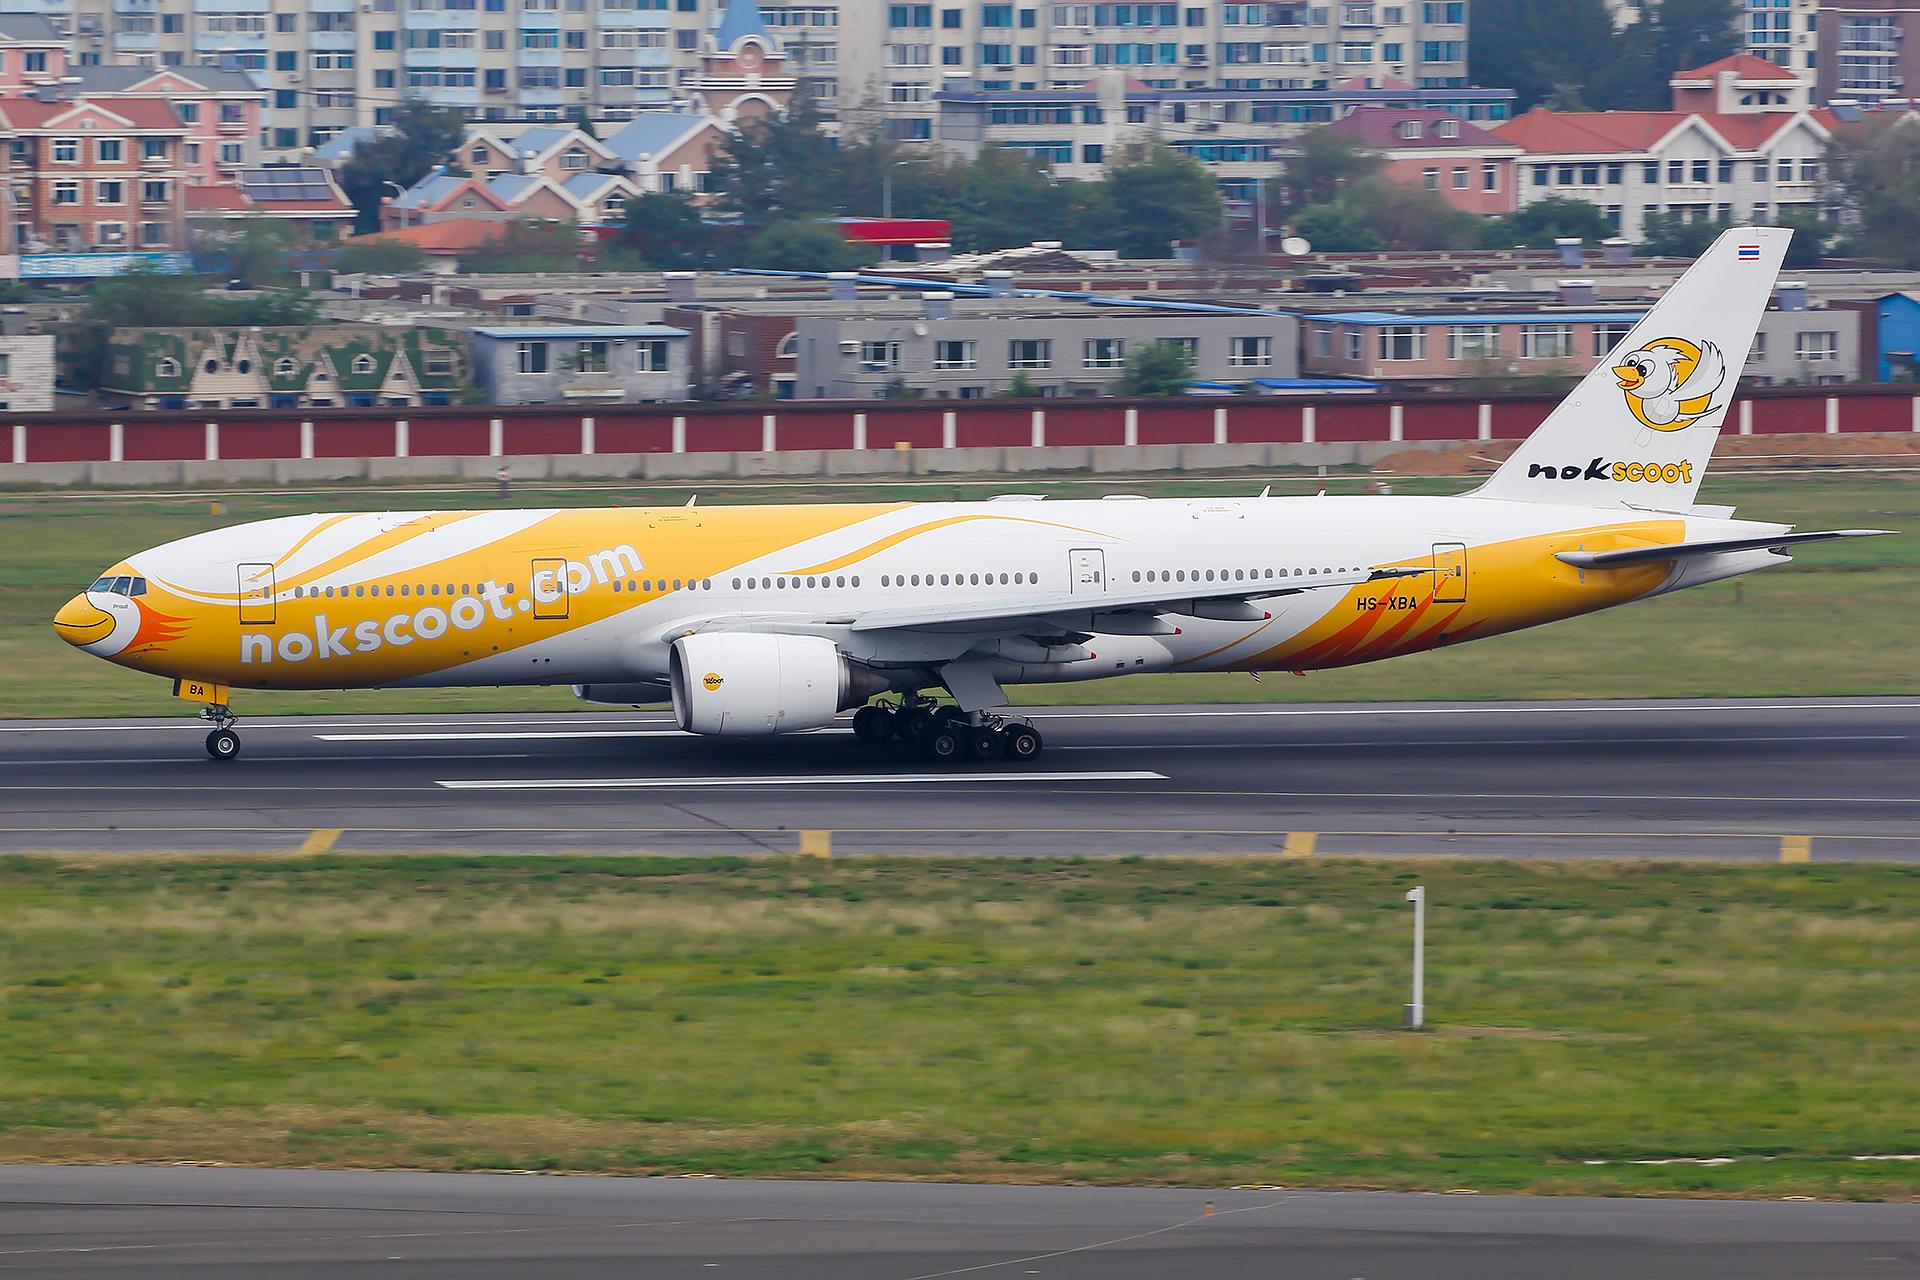 [DLC]。。。酷鸟首航,落地反推未开,跑道口脱离。。。 BOEING 777-200ER HS-XBA 中国大连国际机场